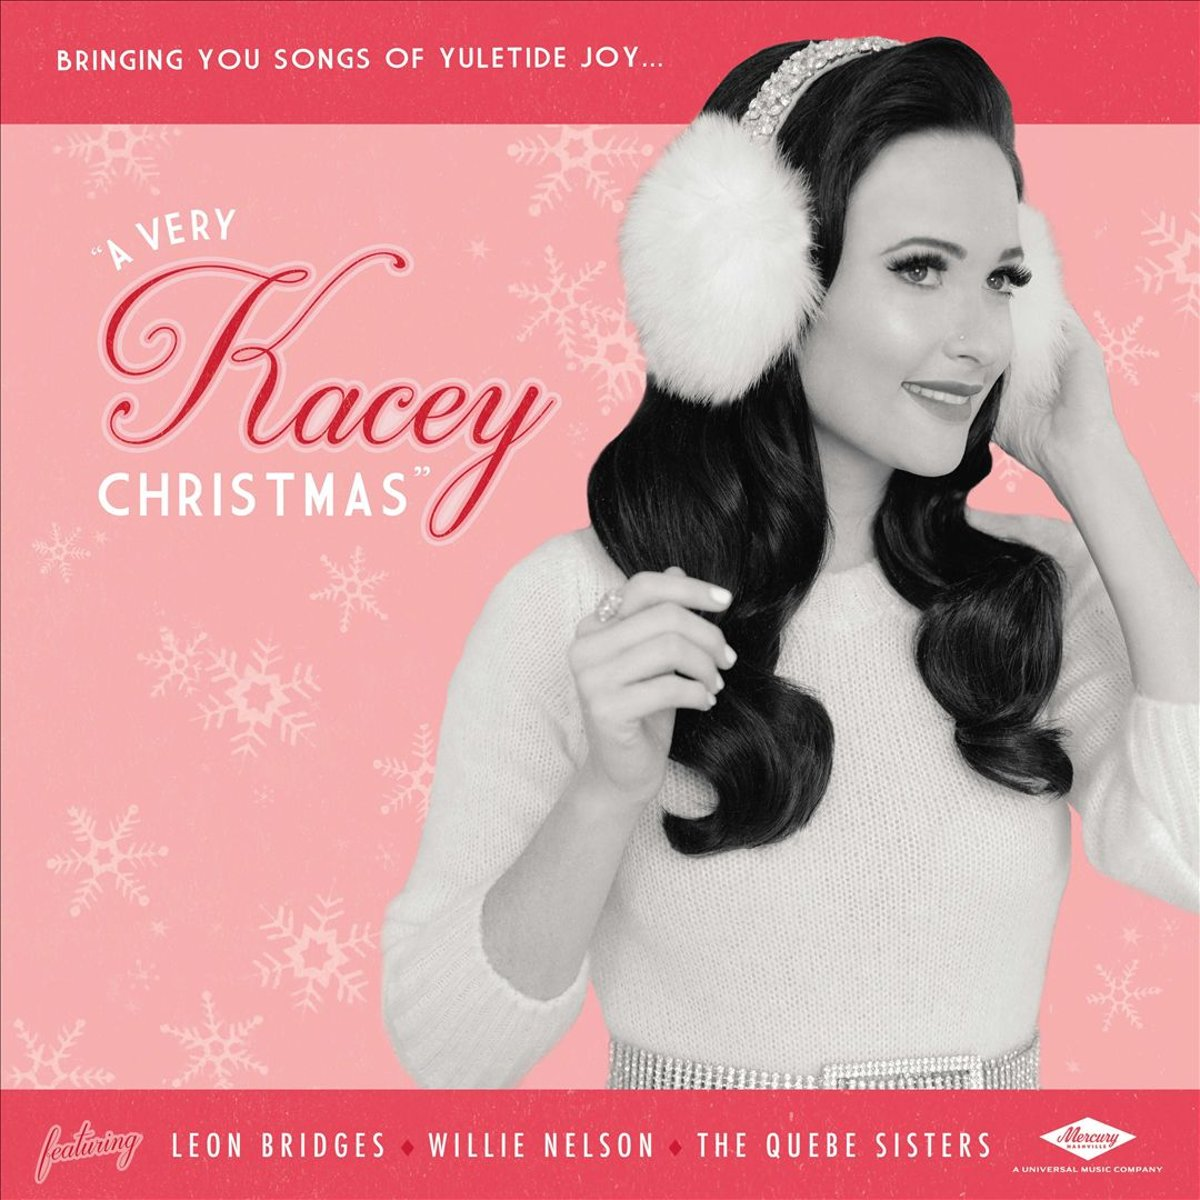 Very Kacey Christmas kopen